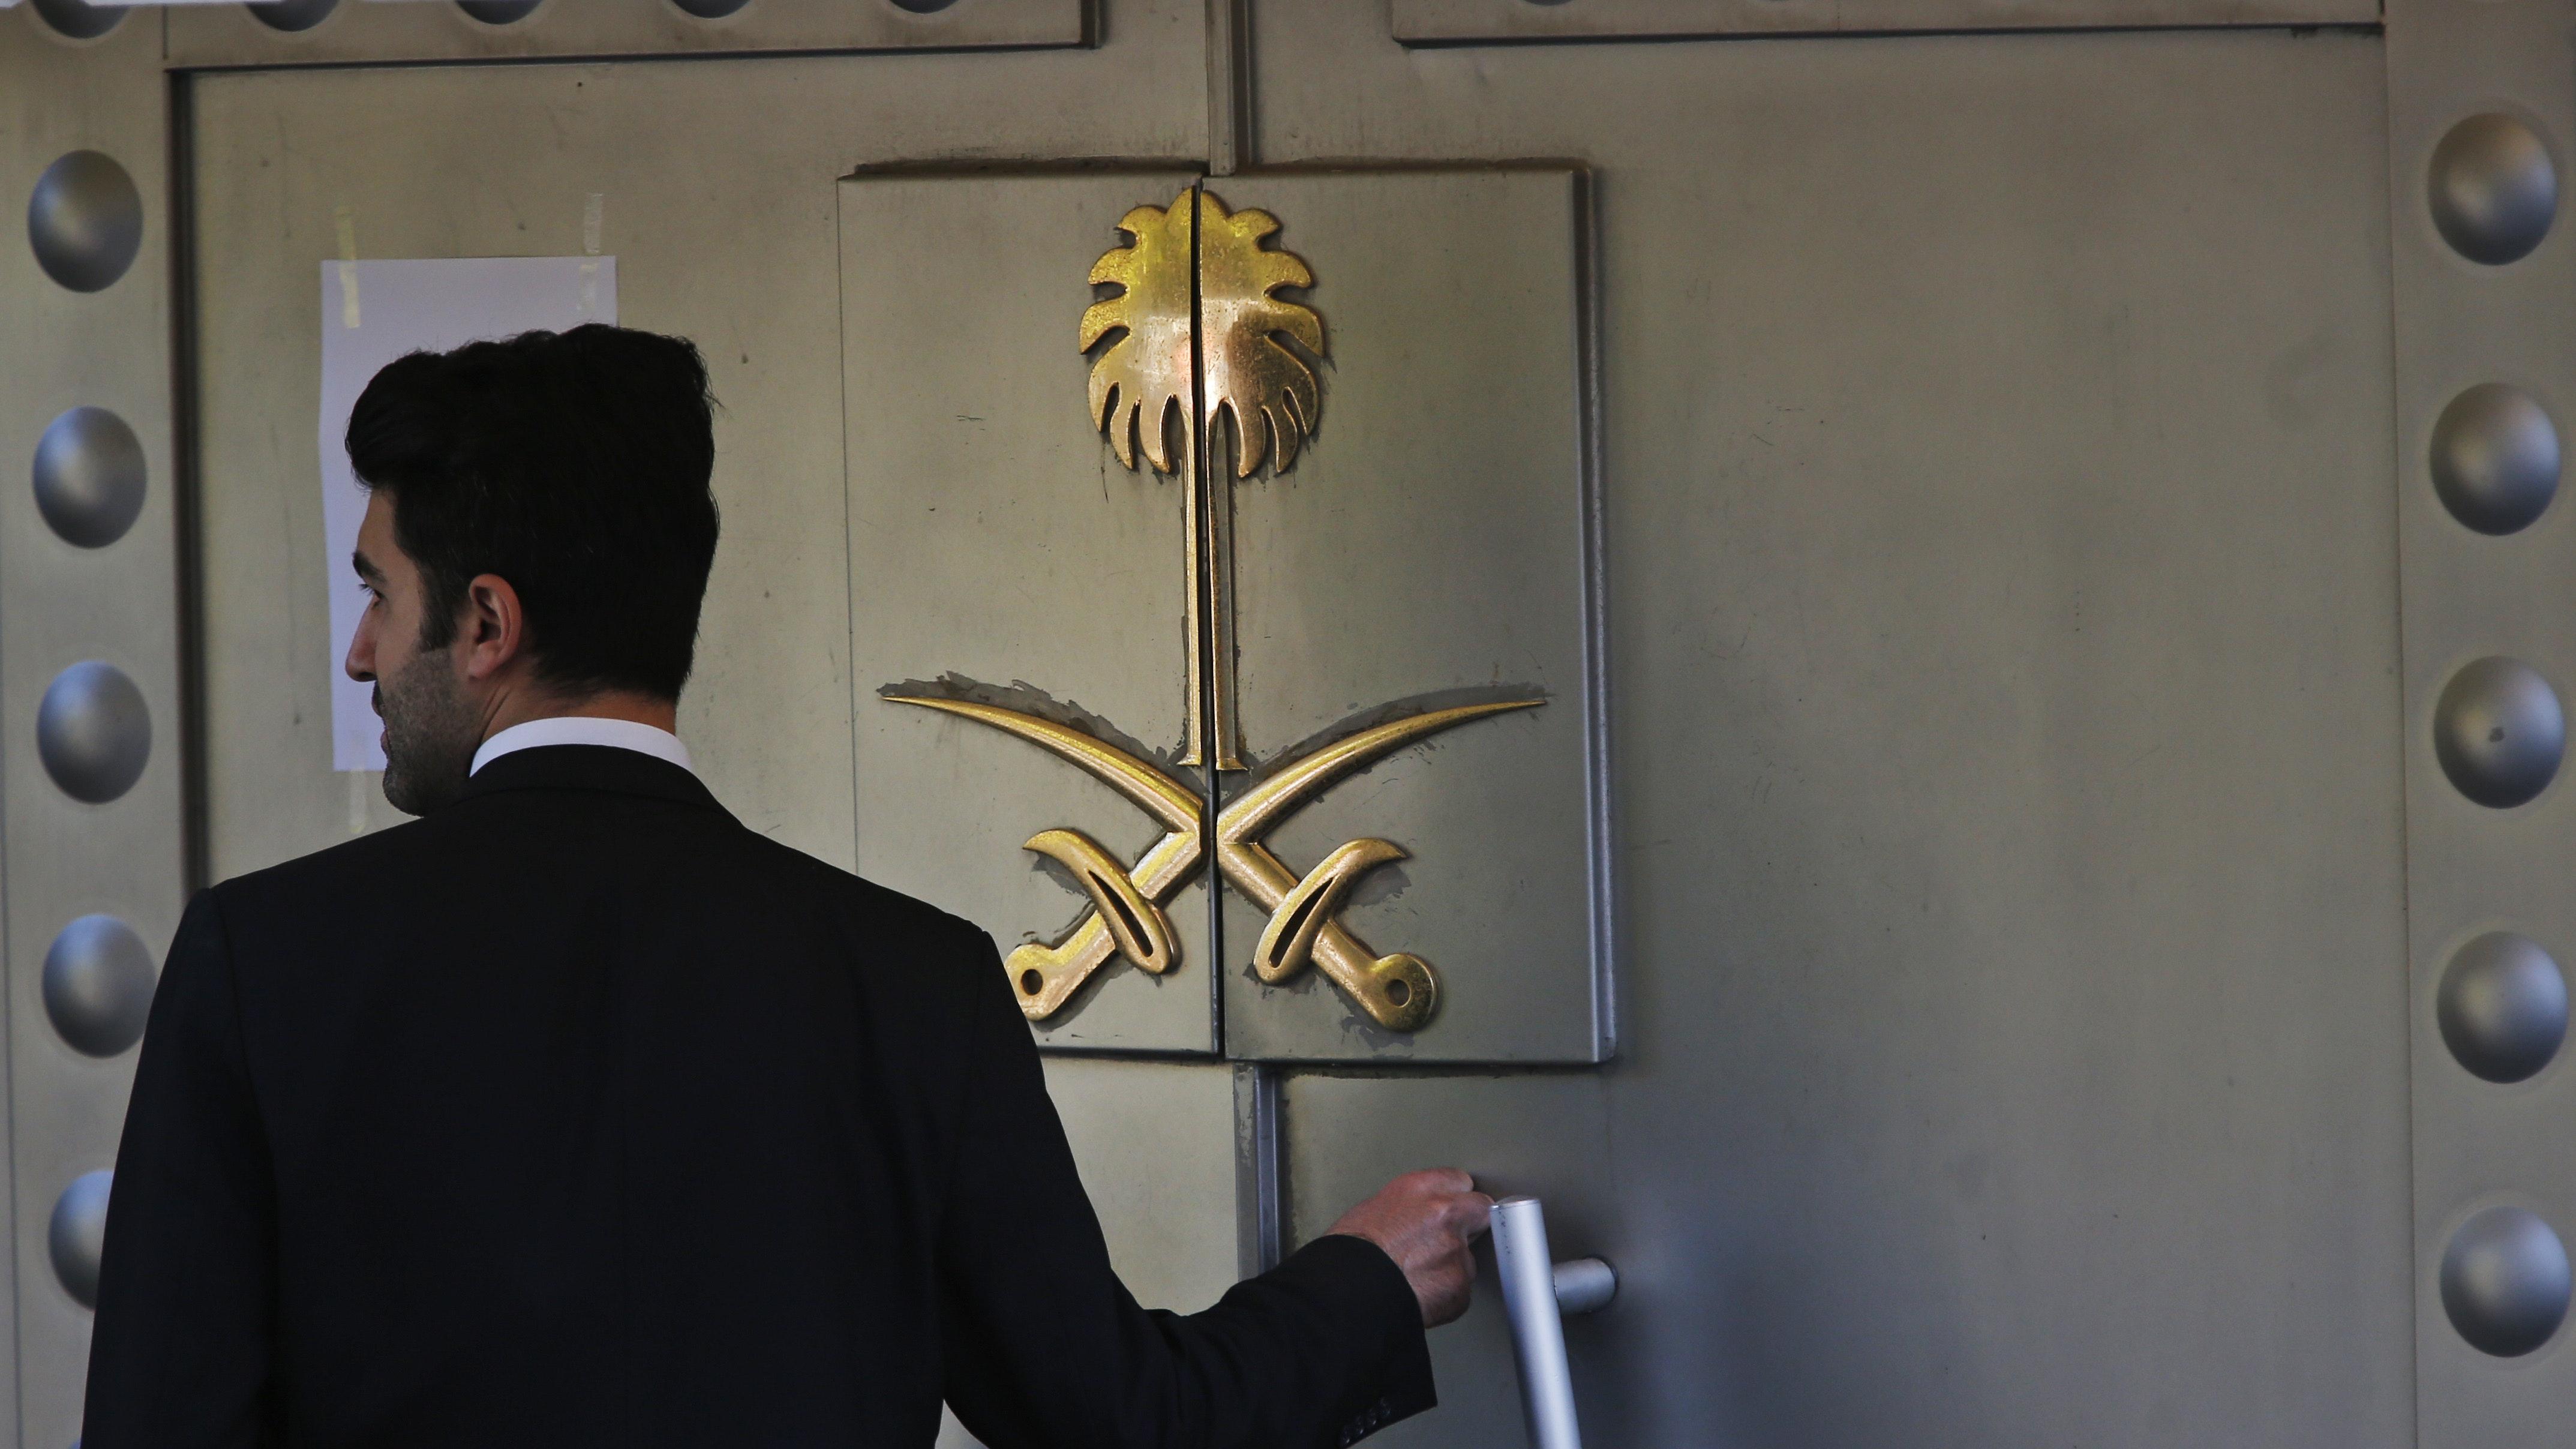 Jamal Khashoggi 'strangled as soon as he entered consulate'